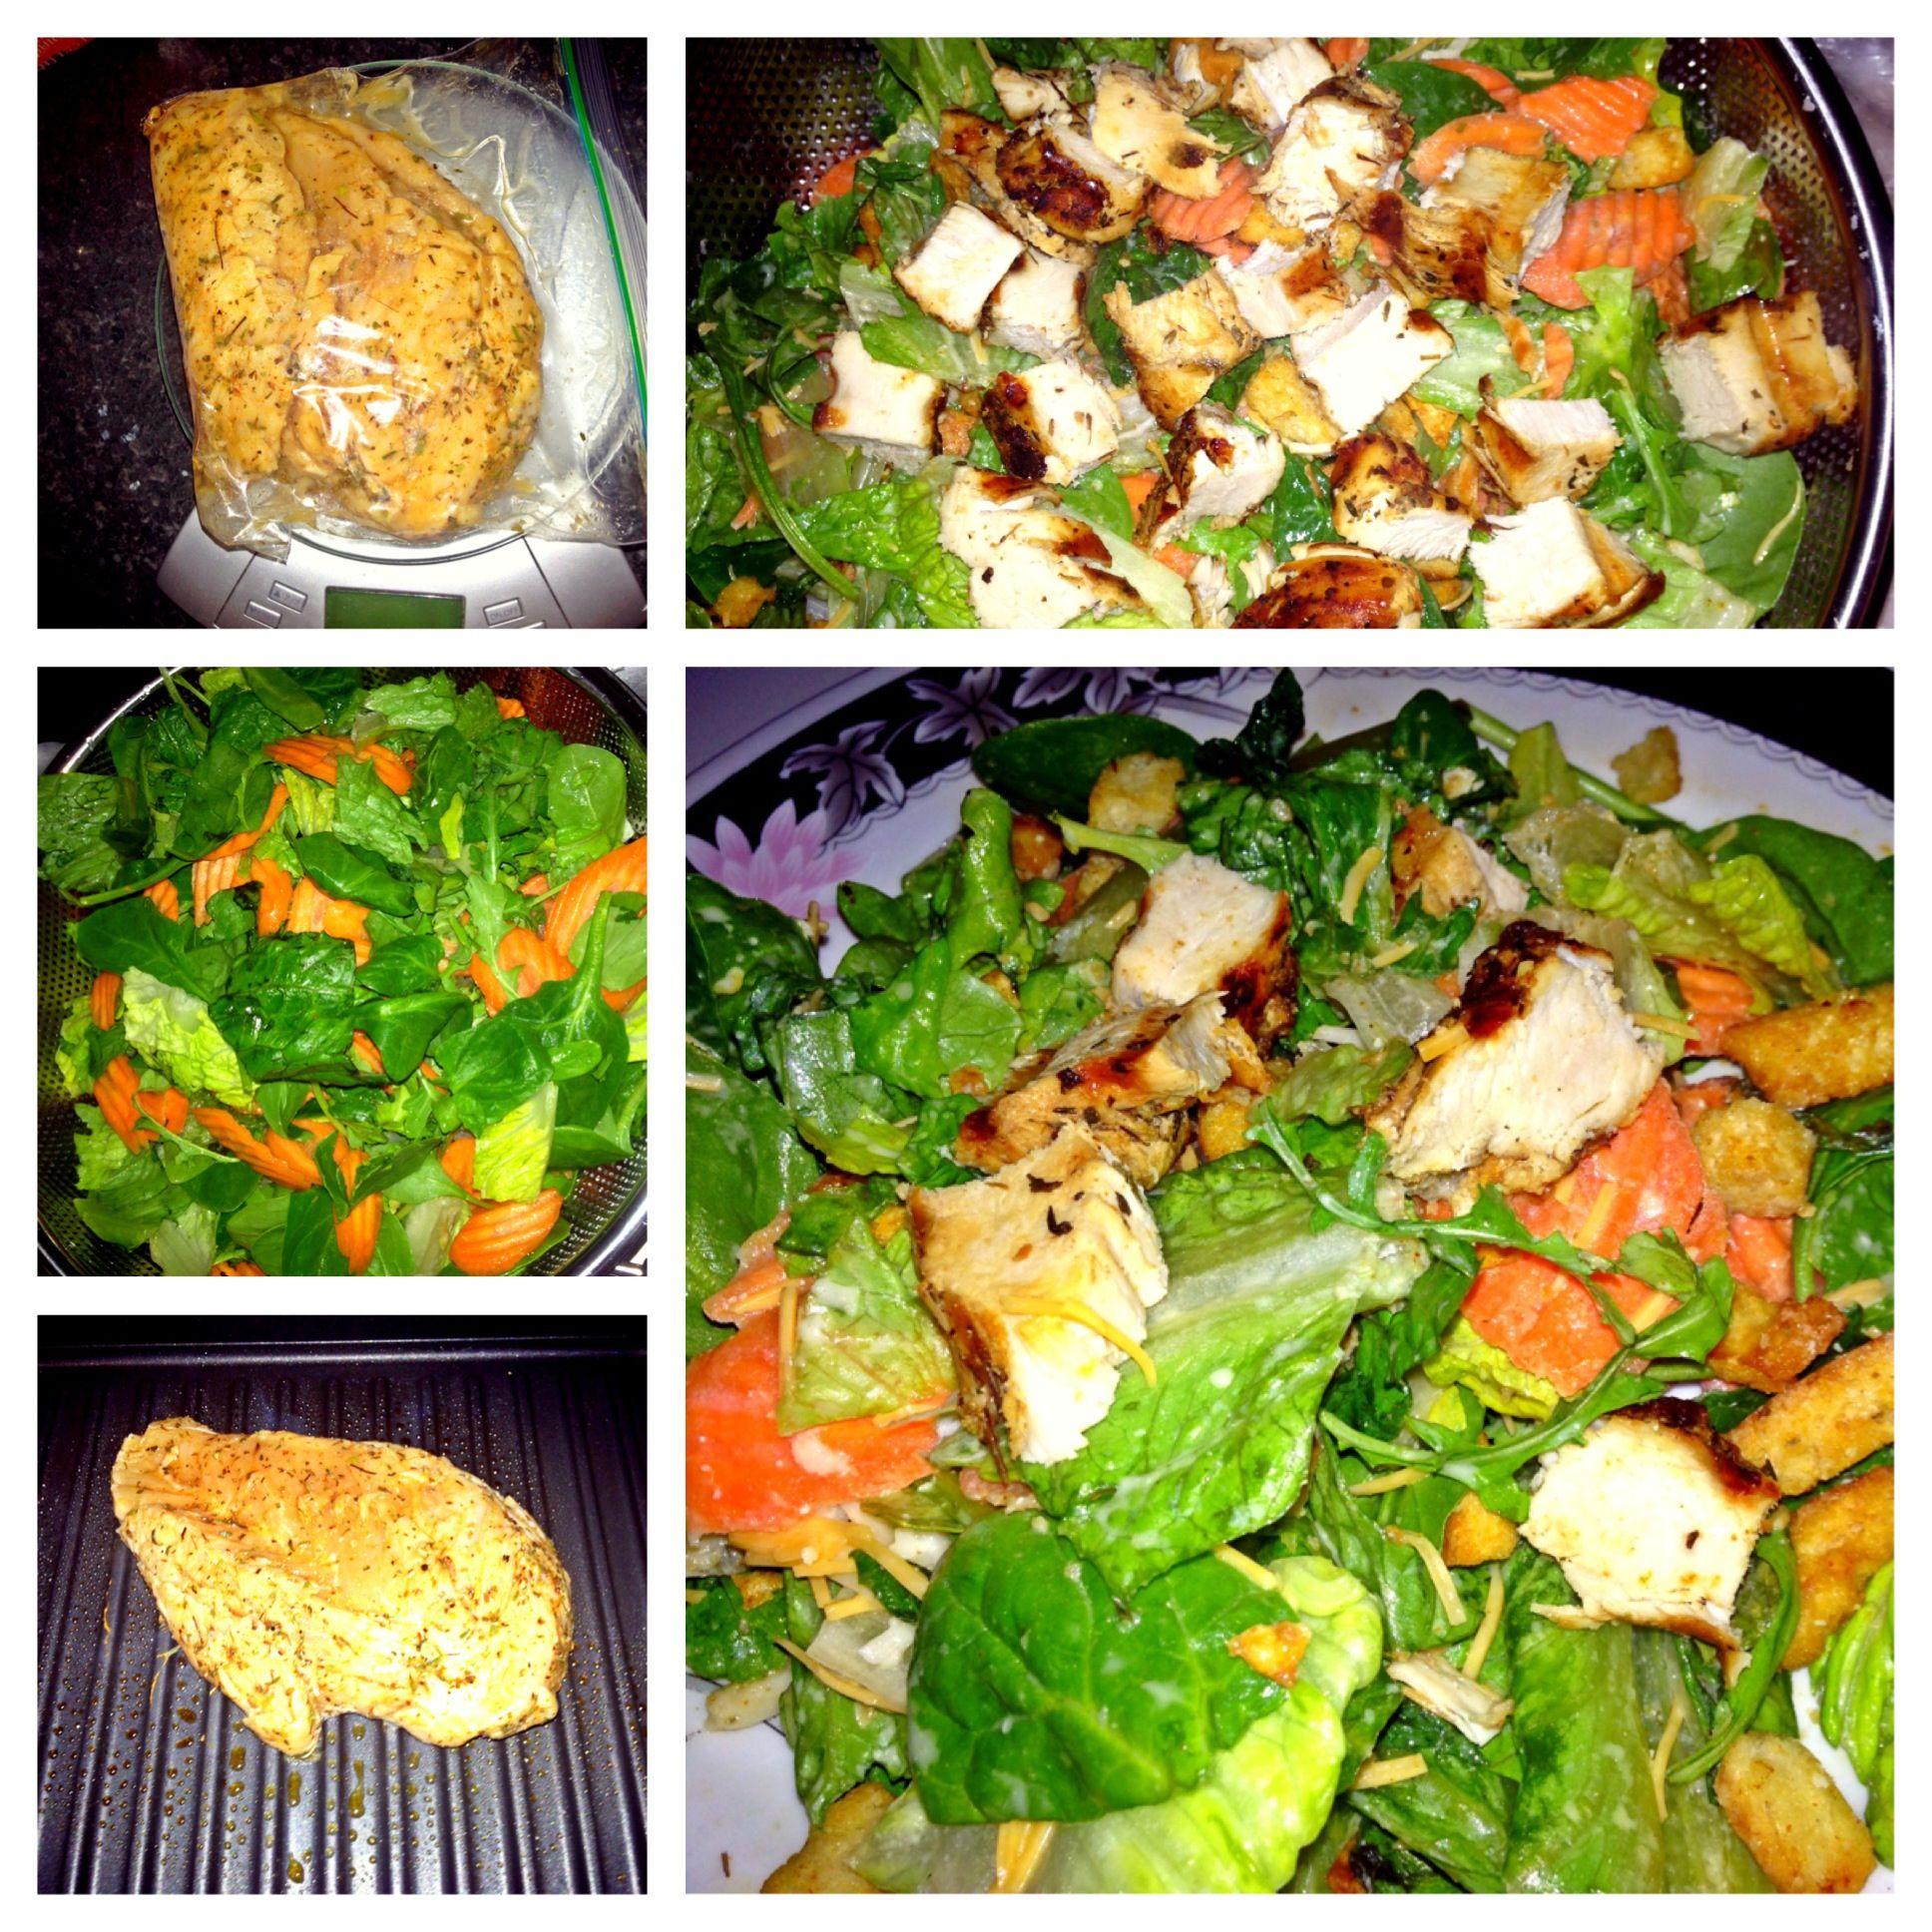 GrilledChicken Salad w/ my sister's Olive Garden dressing